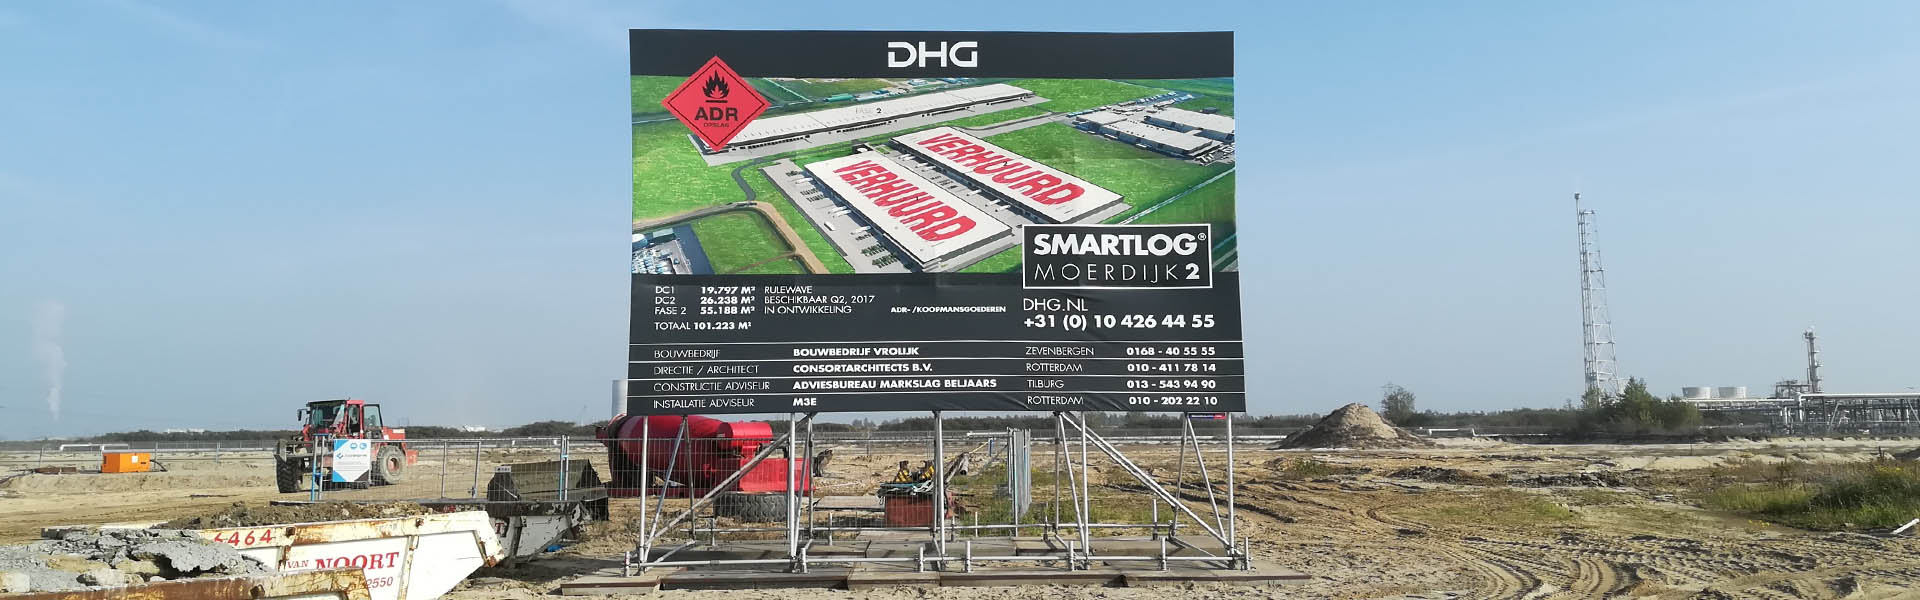 DHG bouwbord Image Building